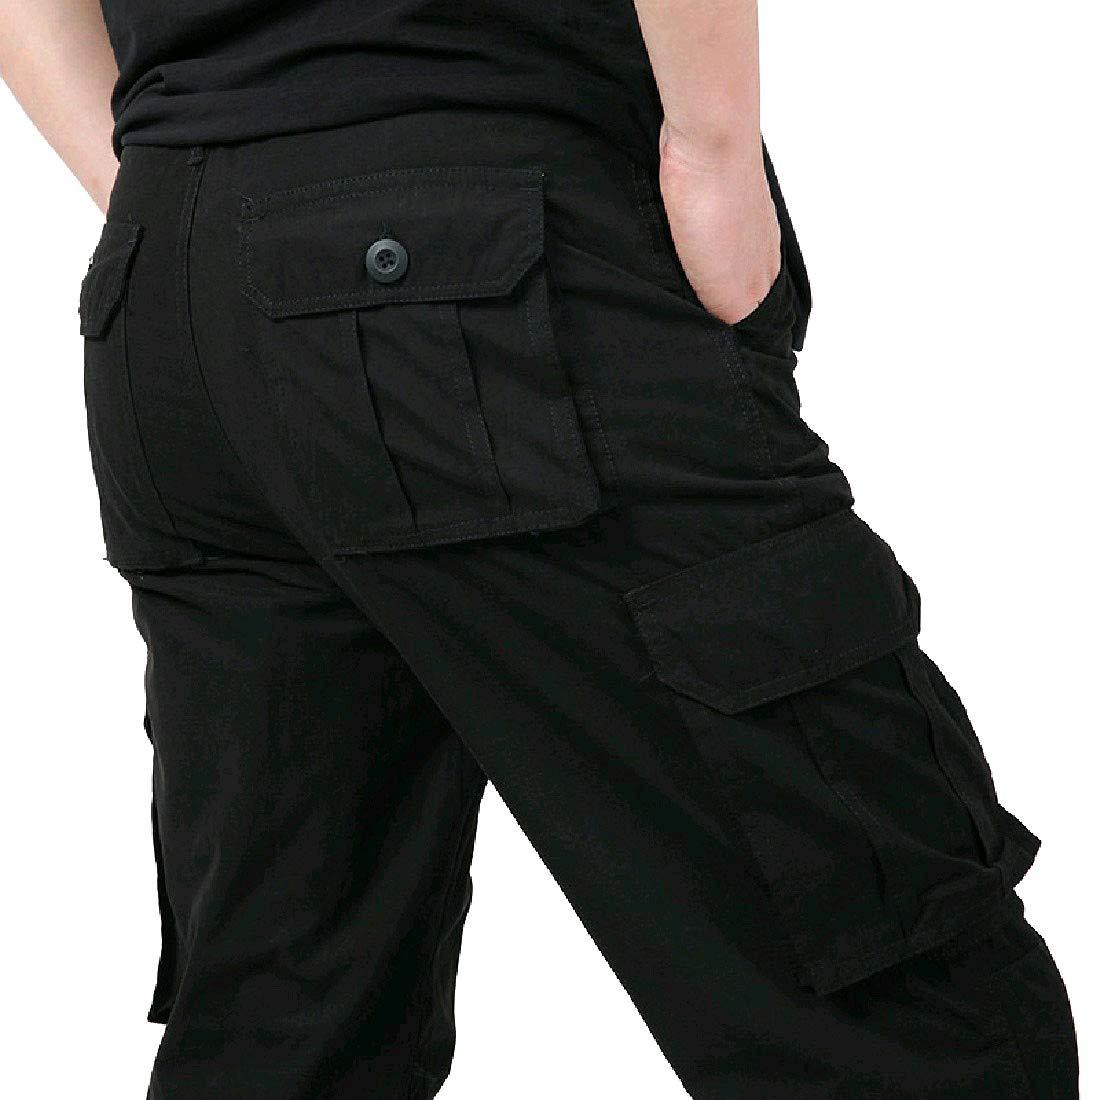 6ef355c0f 3 Abetteric Men's Outdoor Climbing Workout Workout Workout Warm Oversize  Work Cargo Pants 5f2a1a